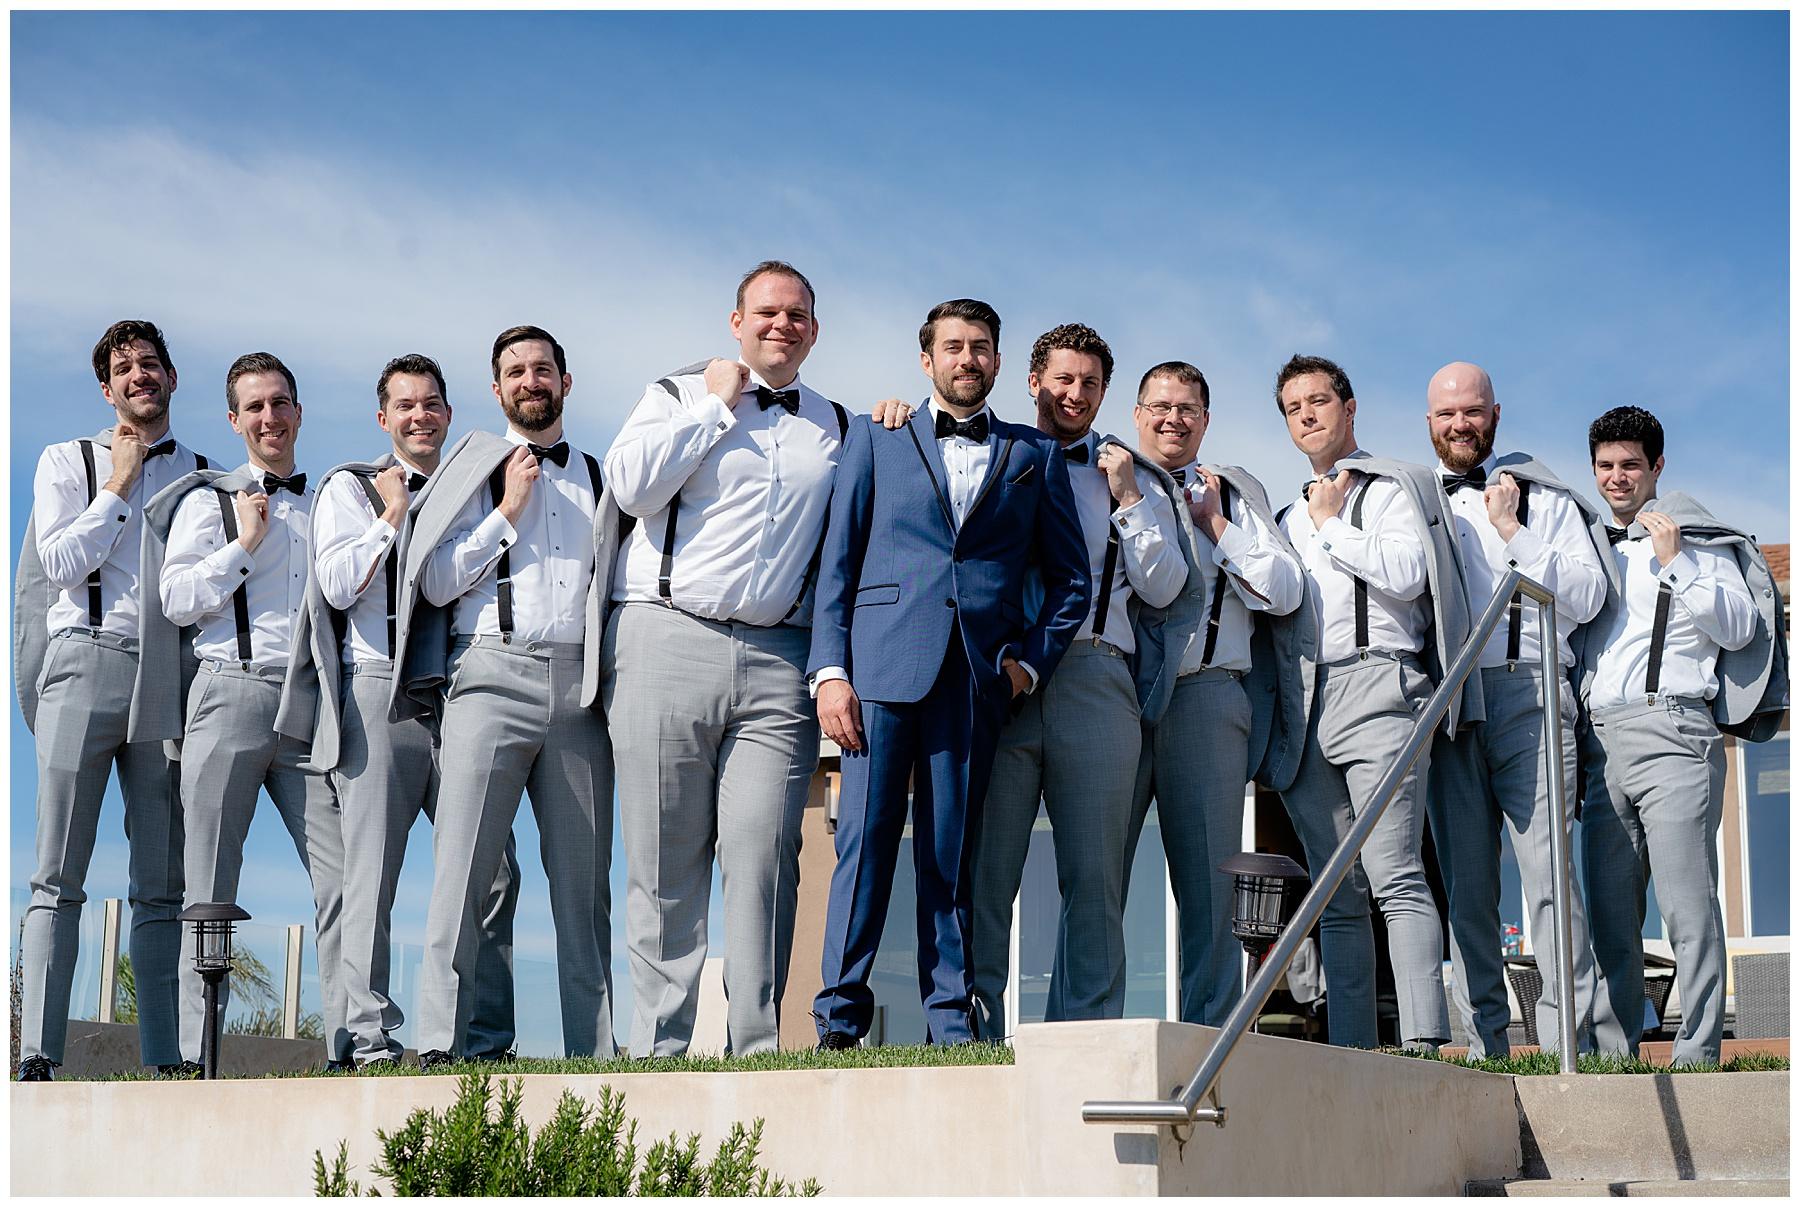 groomsmen photo jackets over shoulder